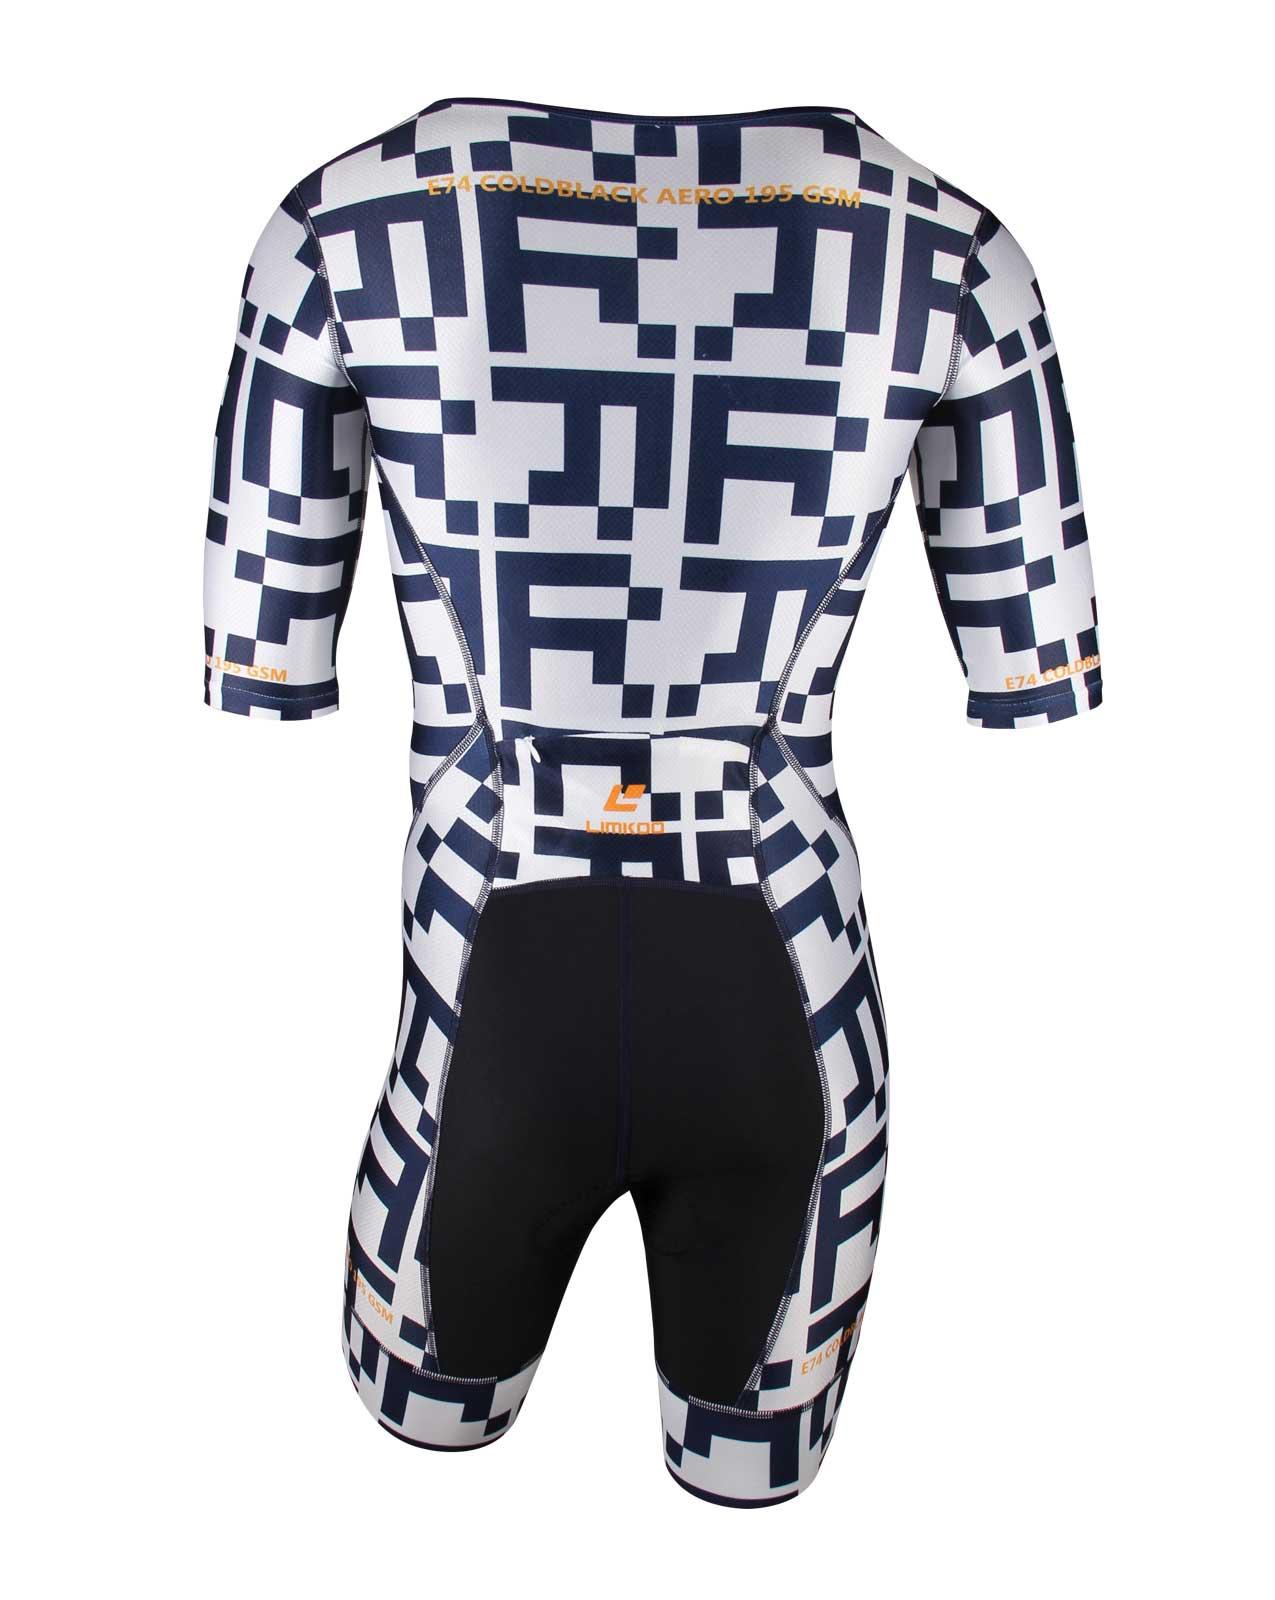 303cb601836 Swiss COLDBLACK AERO Short Sleeve Tri Suit